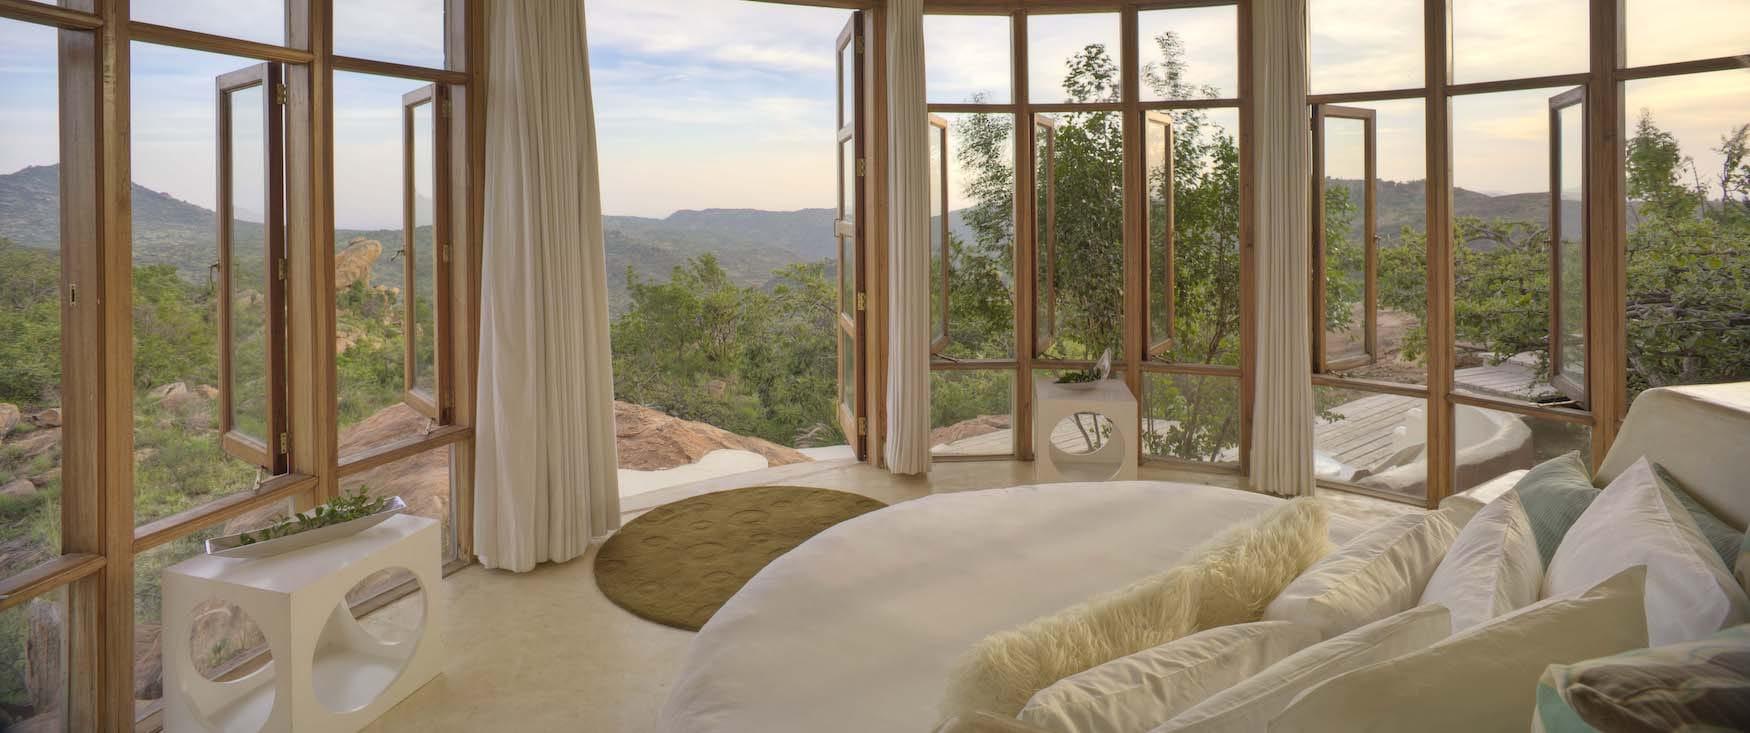 Blick aus dem Schlafzimmer des The Sanctuary at Ol Lentille in Kenia